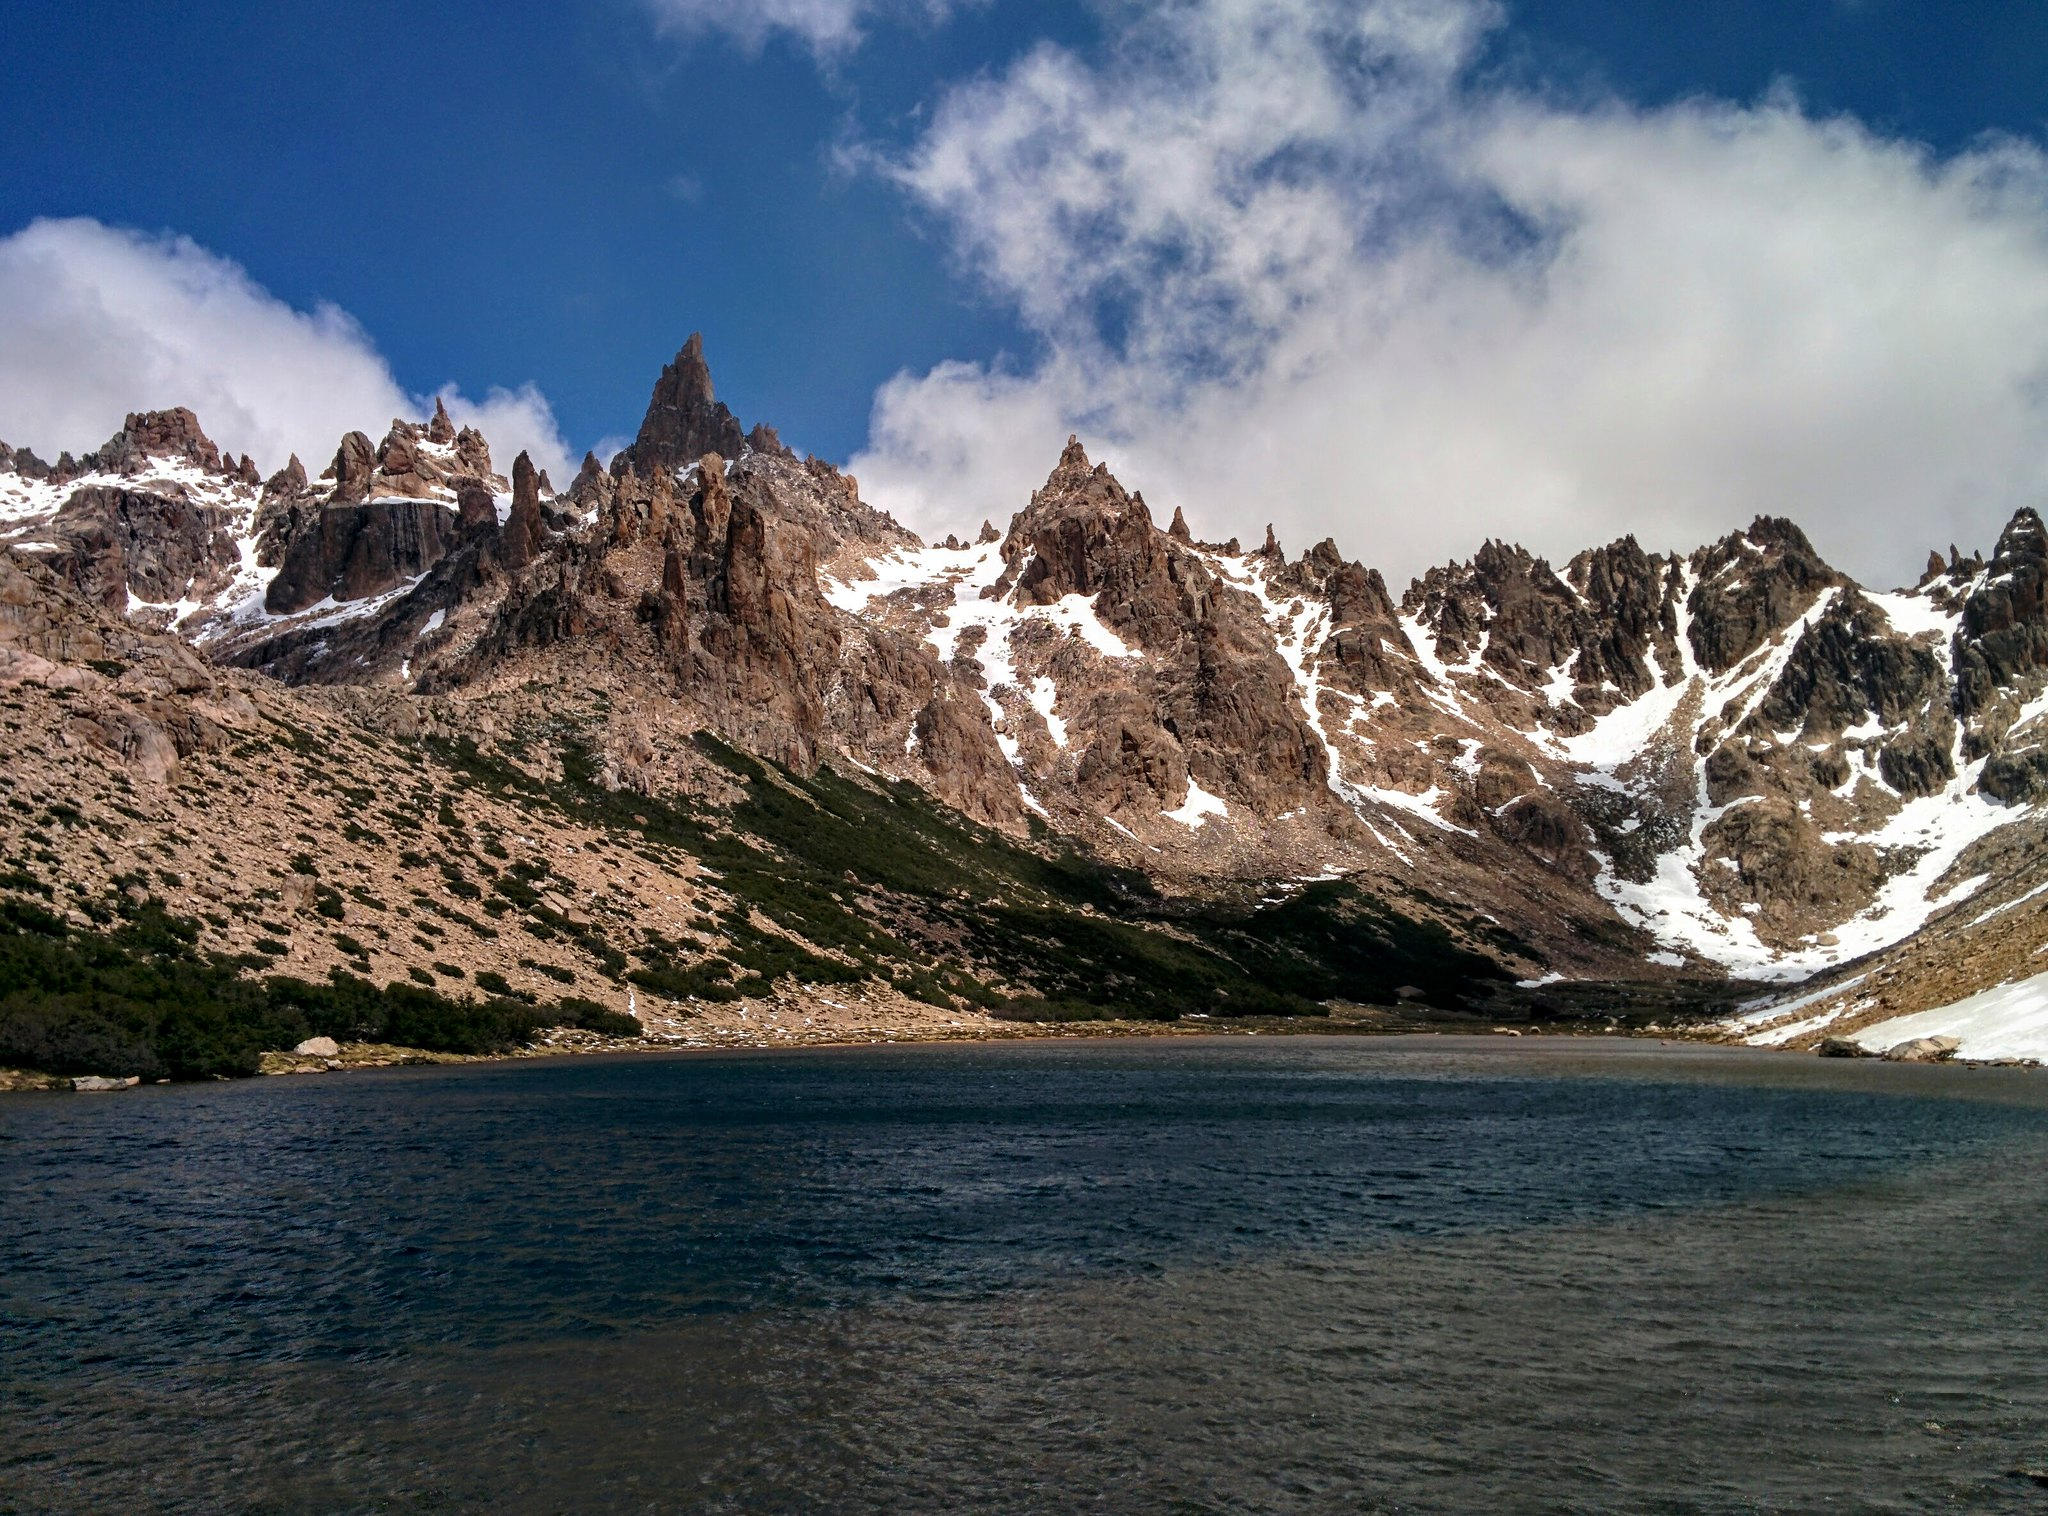 The lake at Refugio Frey